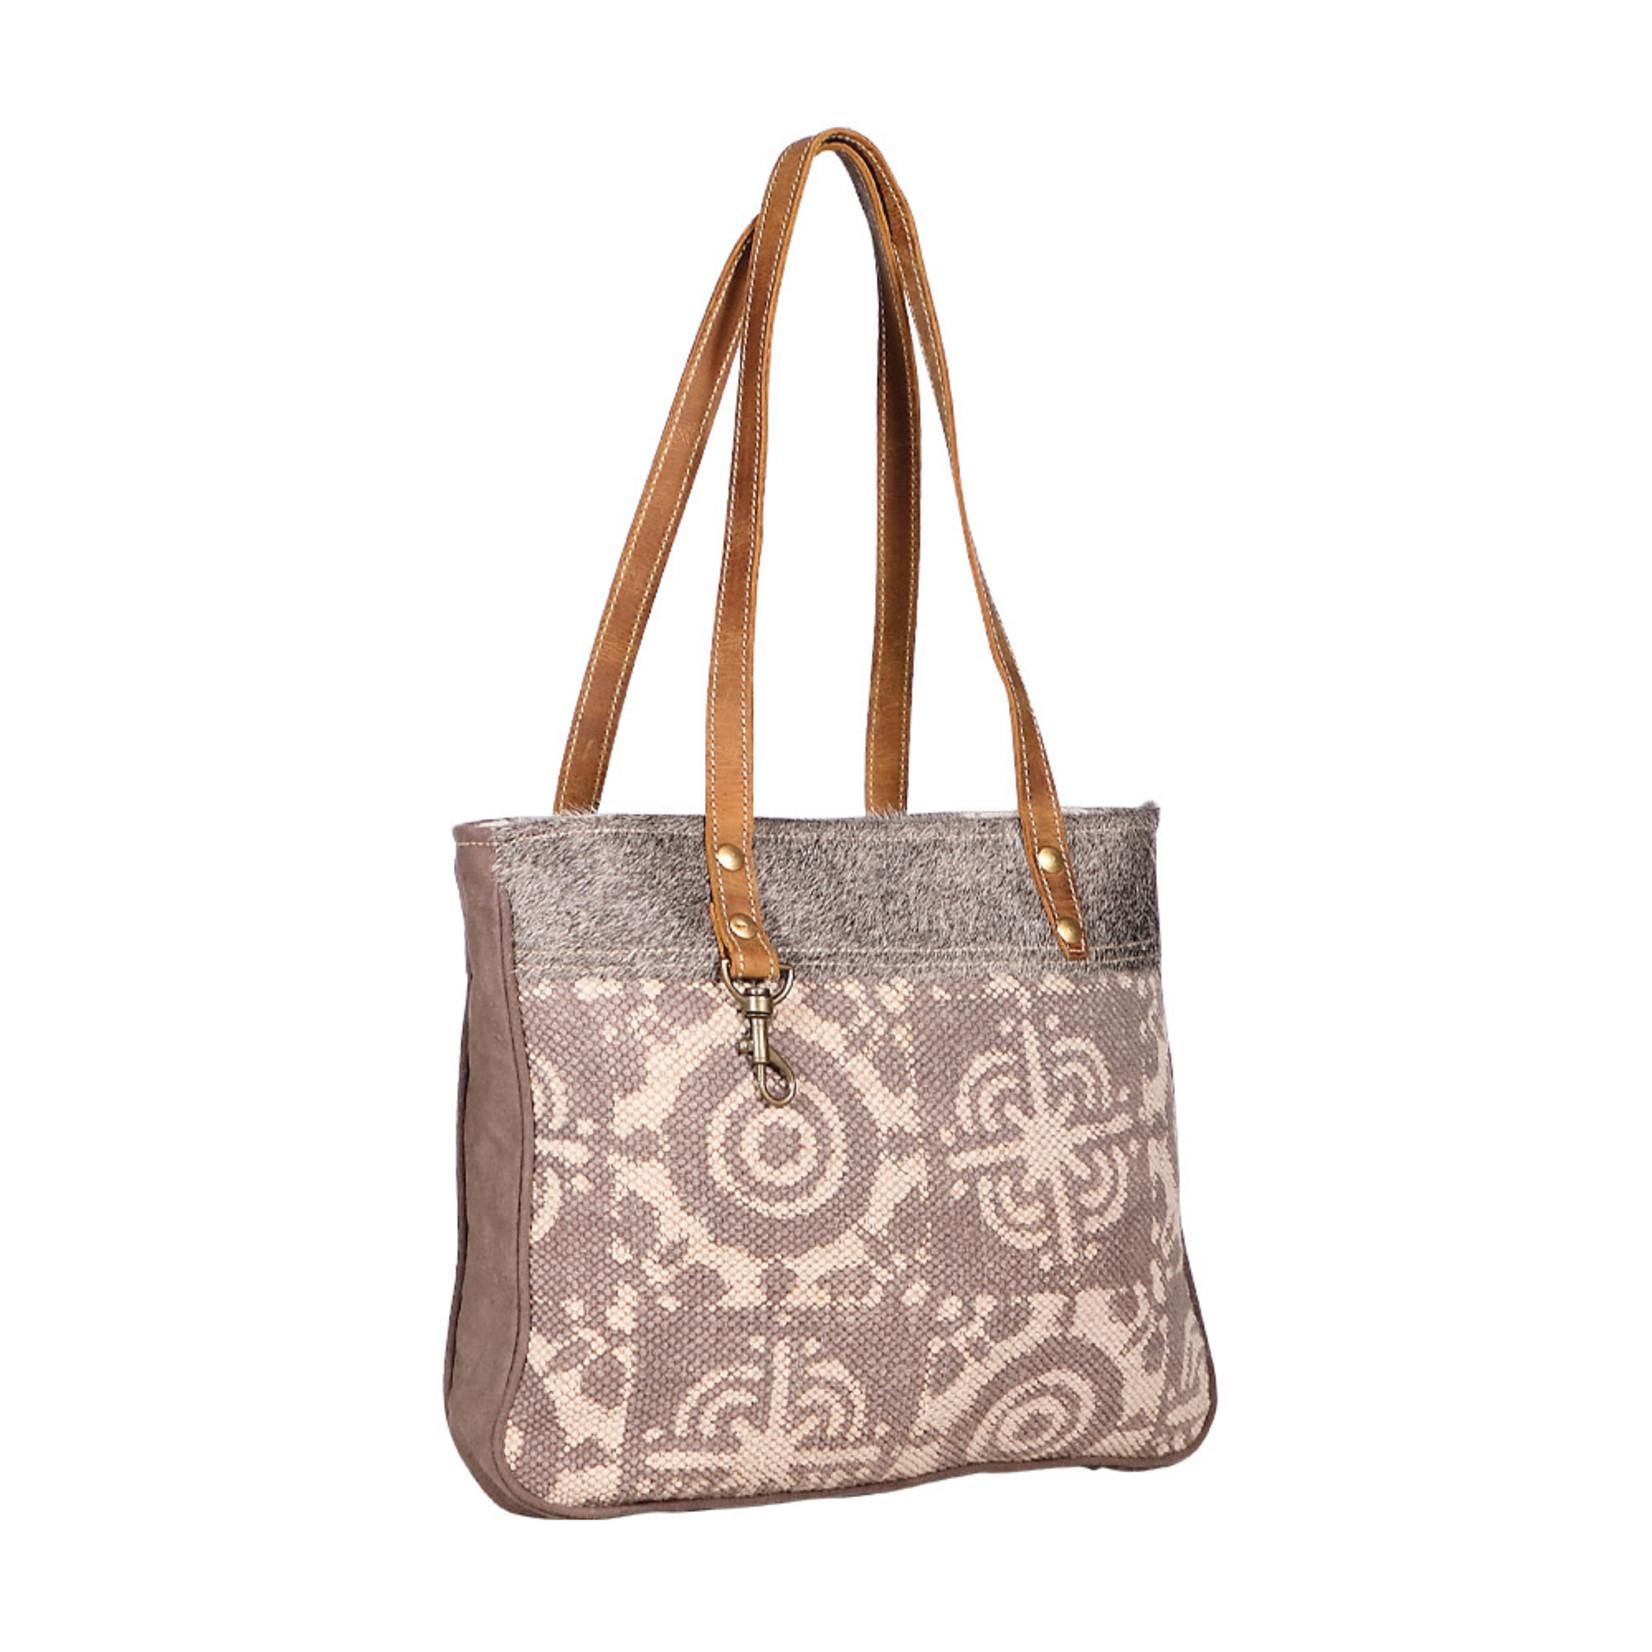 Myra Bags S-1951 Brawny Tote Bag